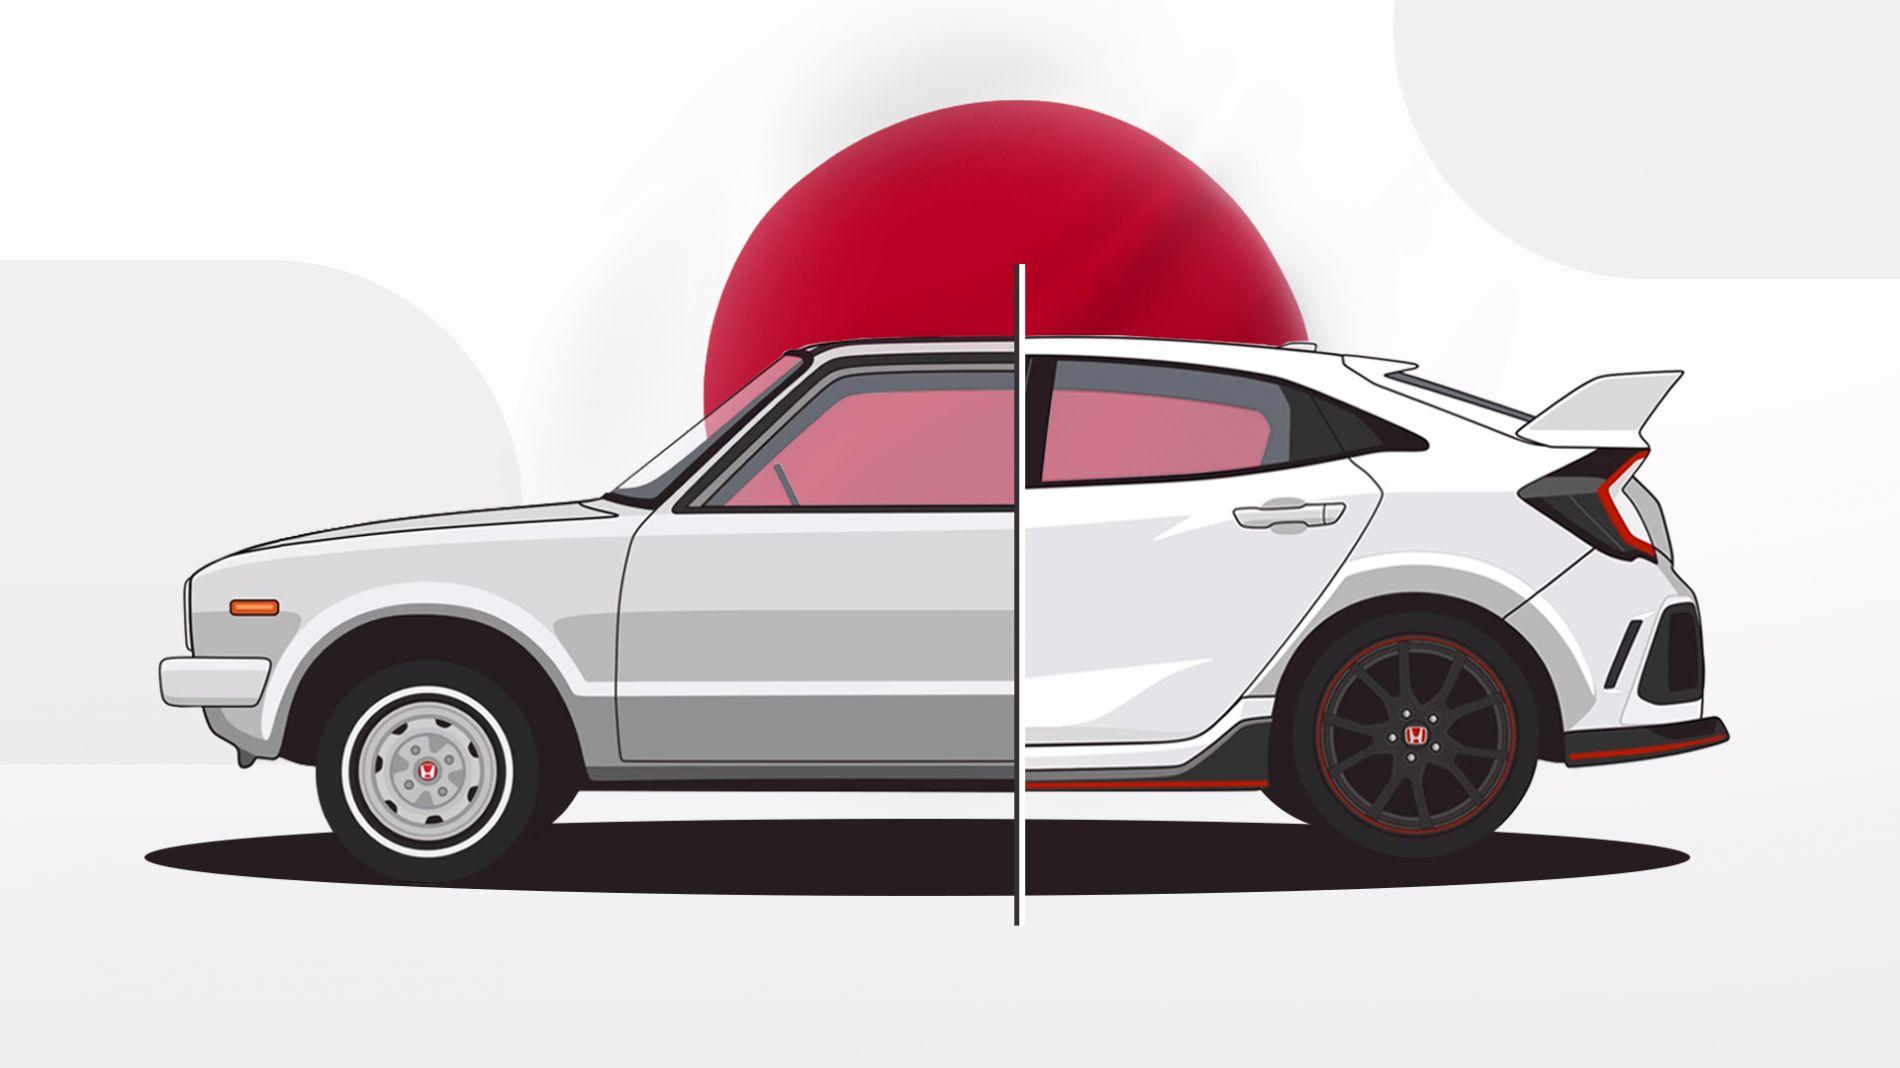 Honda Civic - ყველაზე გაყიდვადი მოდელის ისტორია